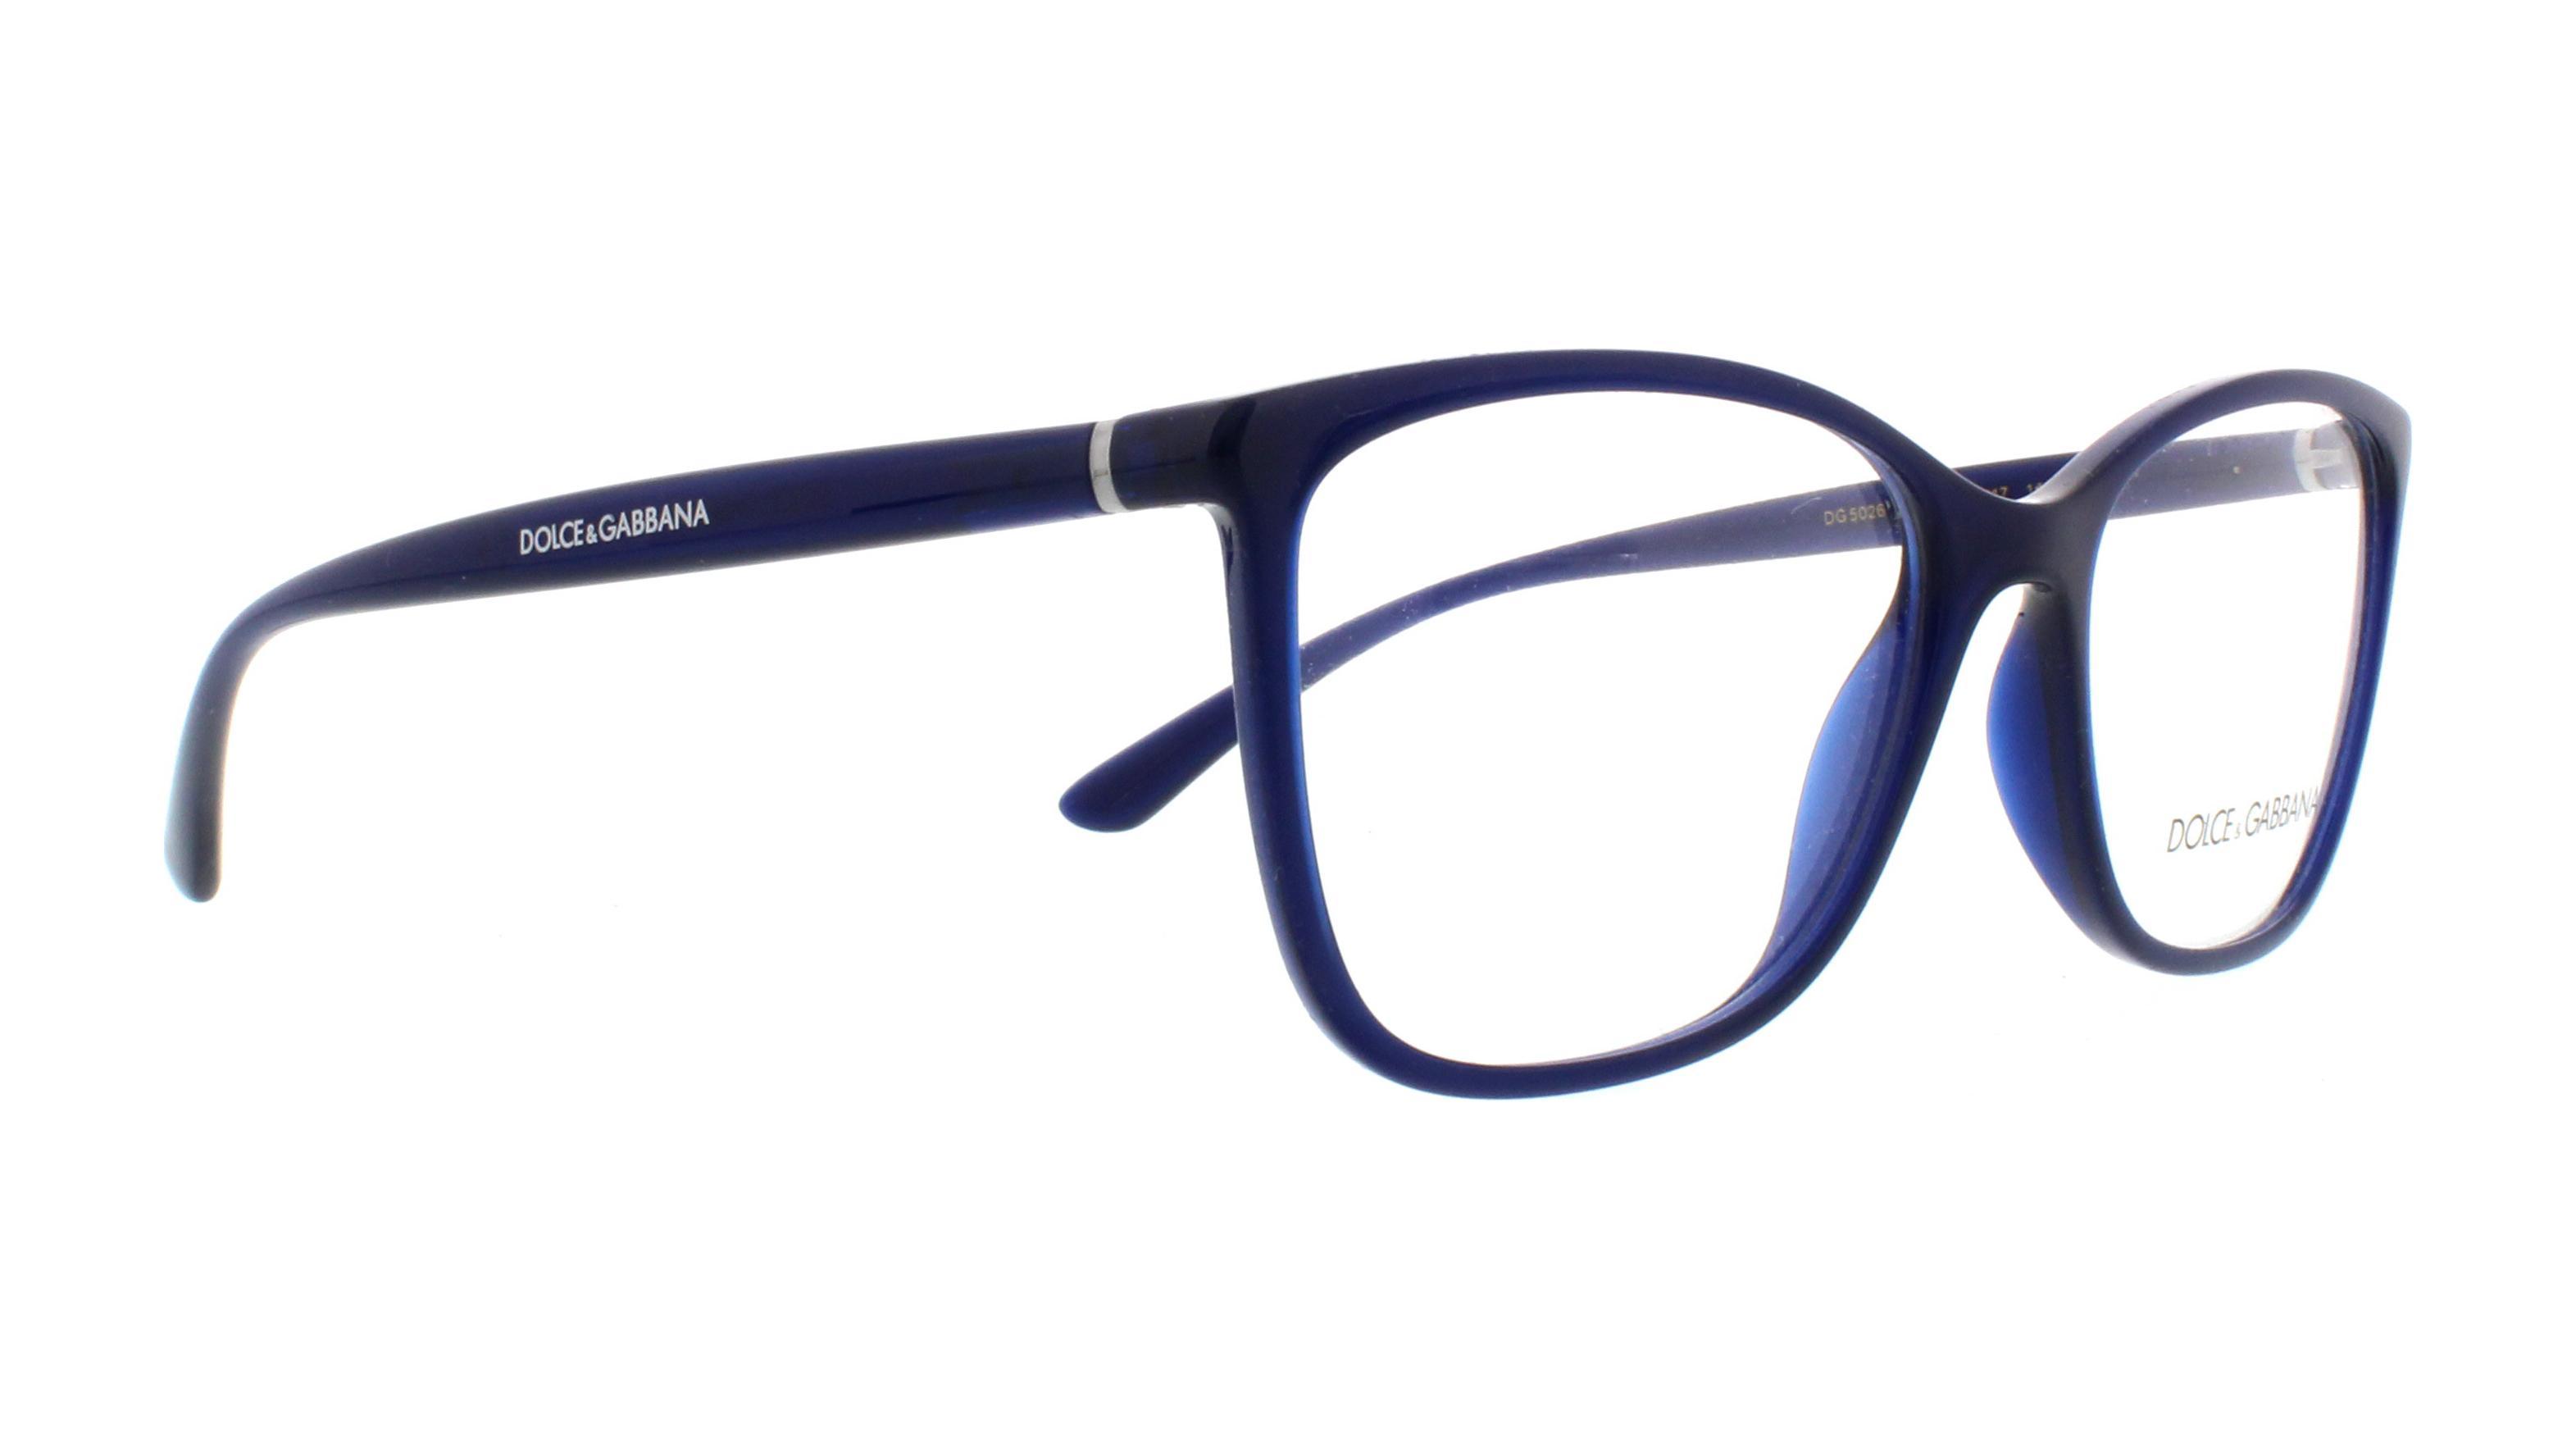 a652516b3178 DOLCE   GABBANA Eyeglasses DG5026 3094 Opal Blue 54MM 8053672822168 ...